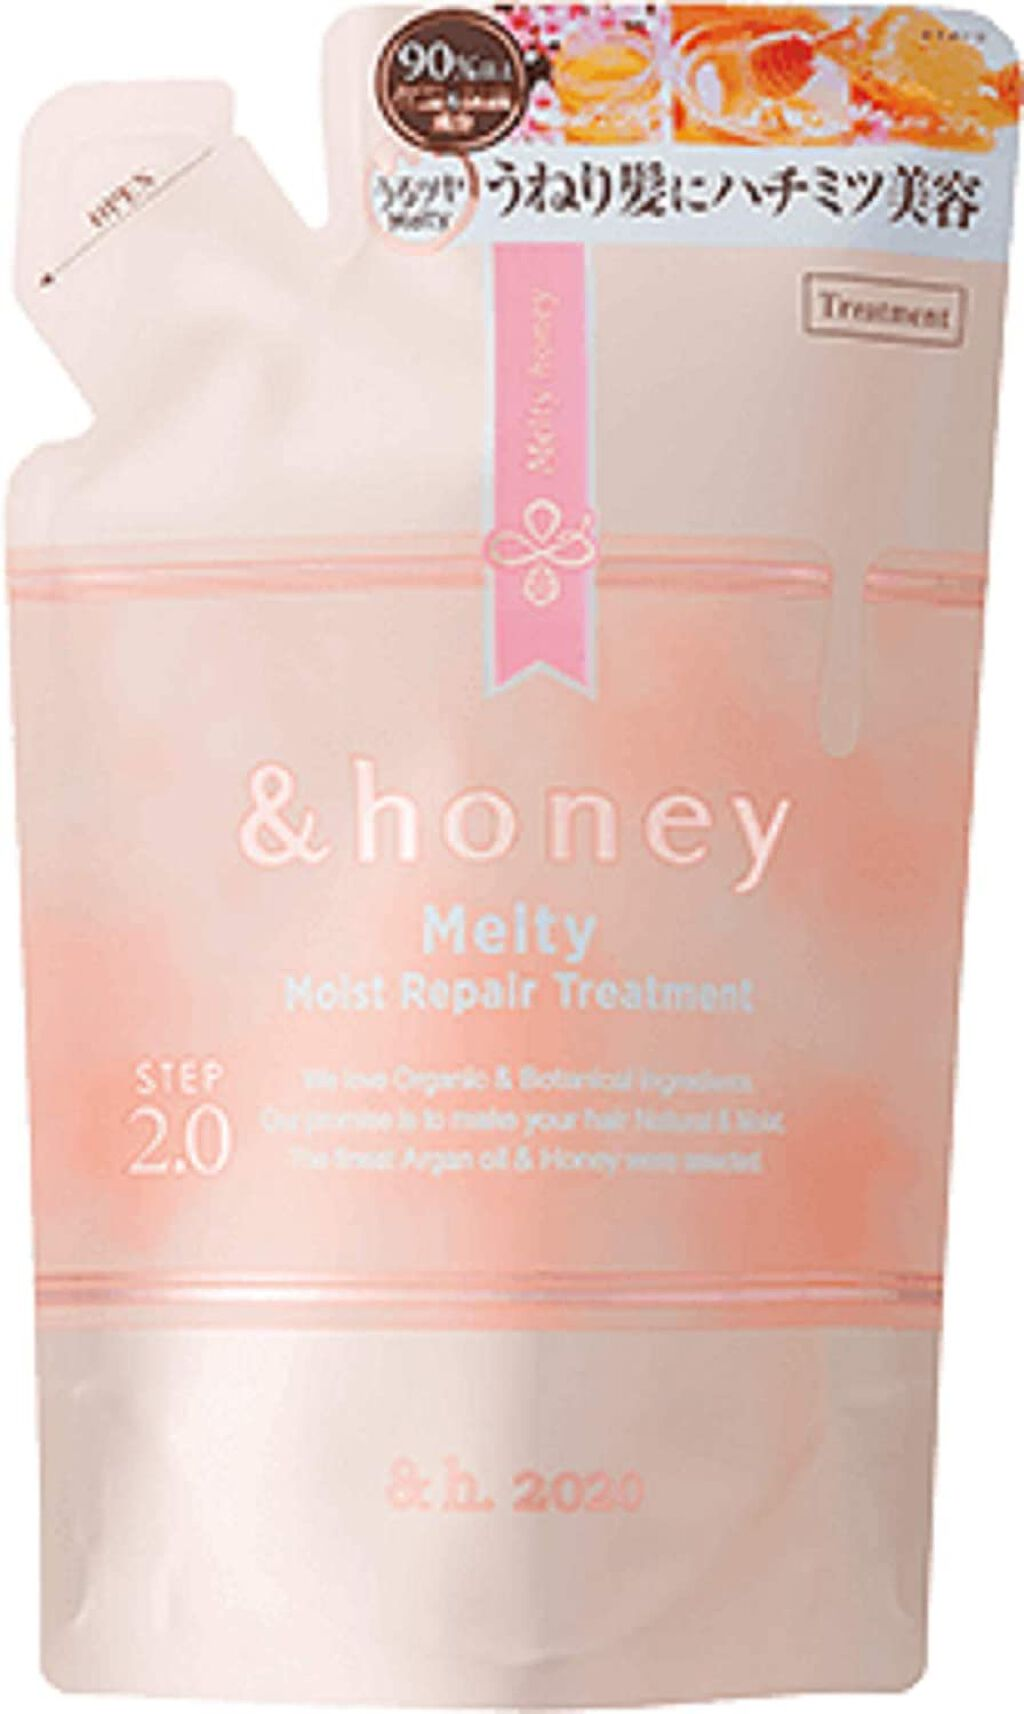 &honey Melty モイストリペア シャンプー1.0/モイストリペア ヘアトリートメント2.0 トリートメント(詰替え)